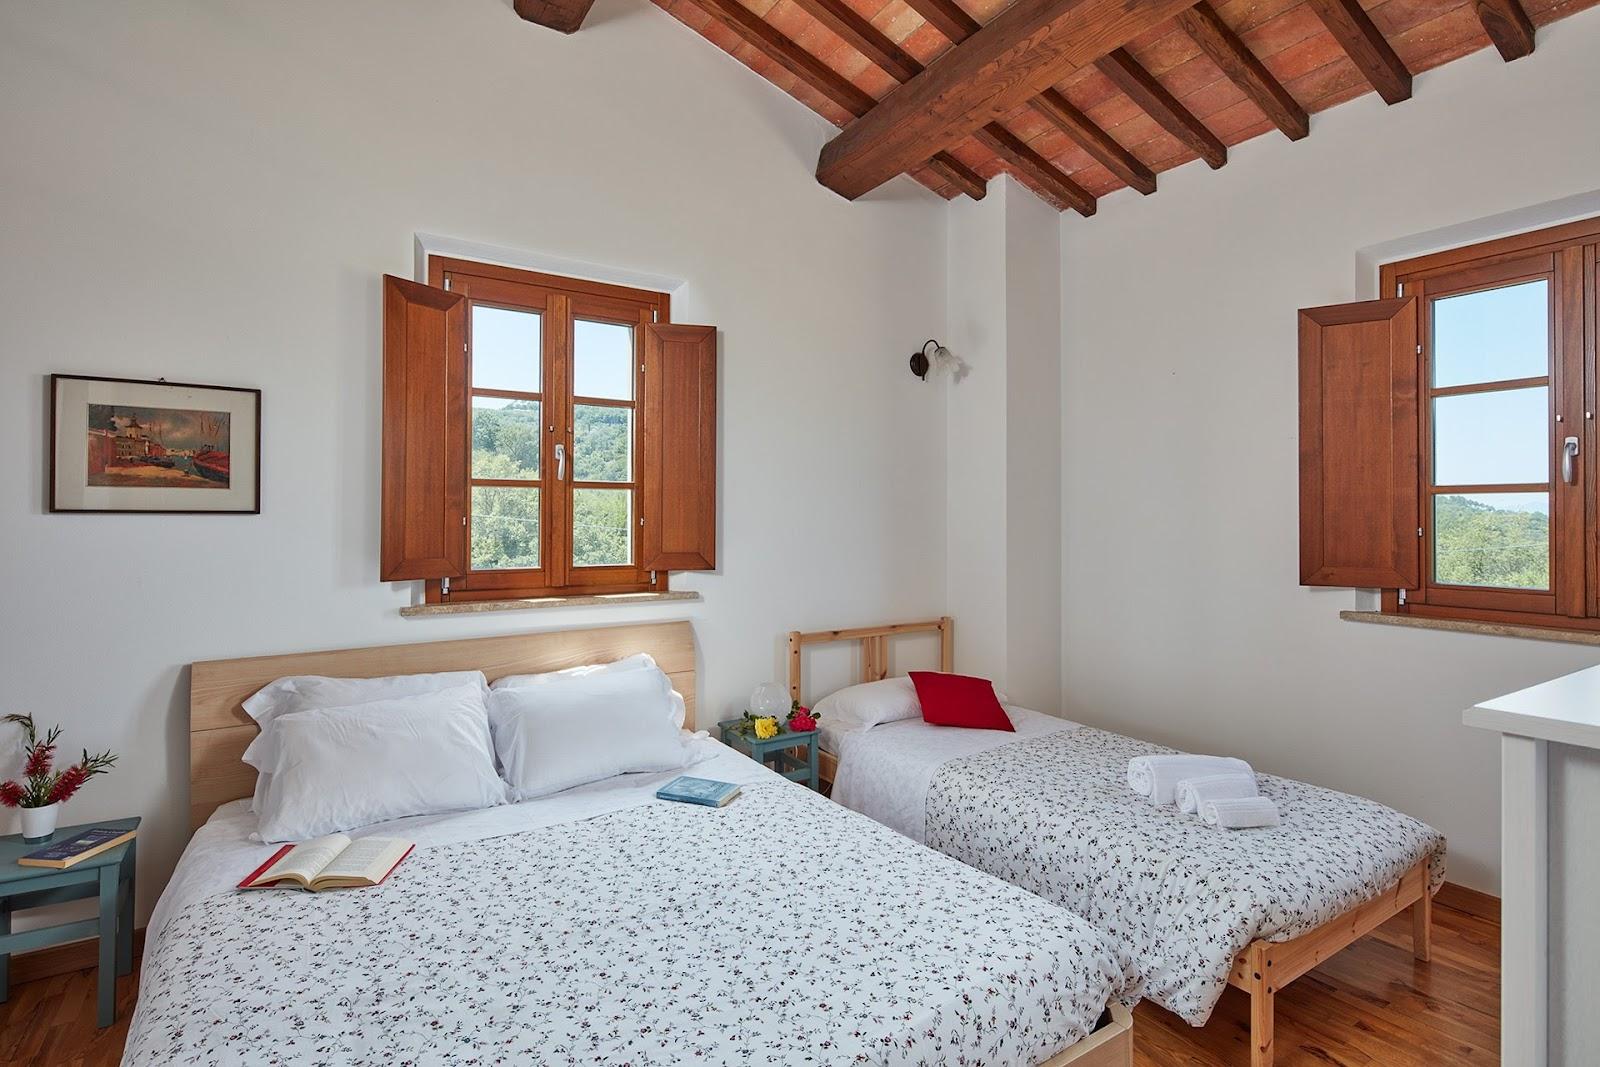 Ferienhaus Corte Paradiso (2570342), Monsummano Terme, Pistoia, Toskana, Italien, Bild 34